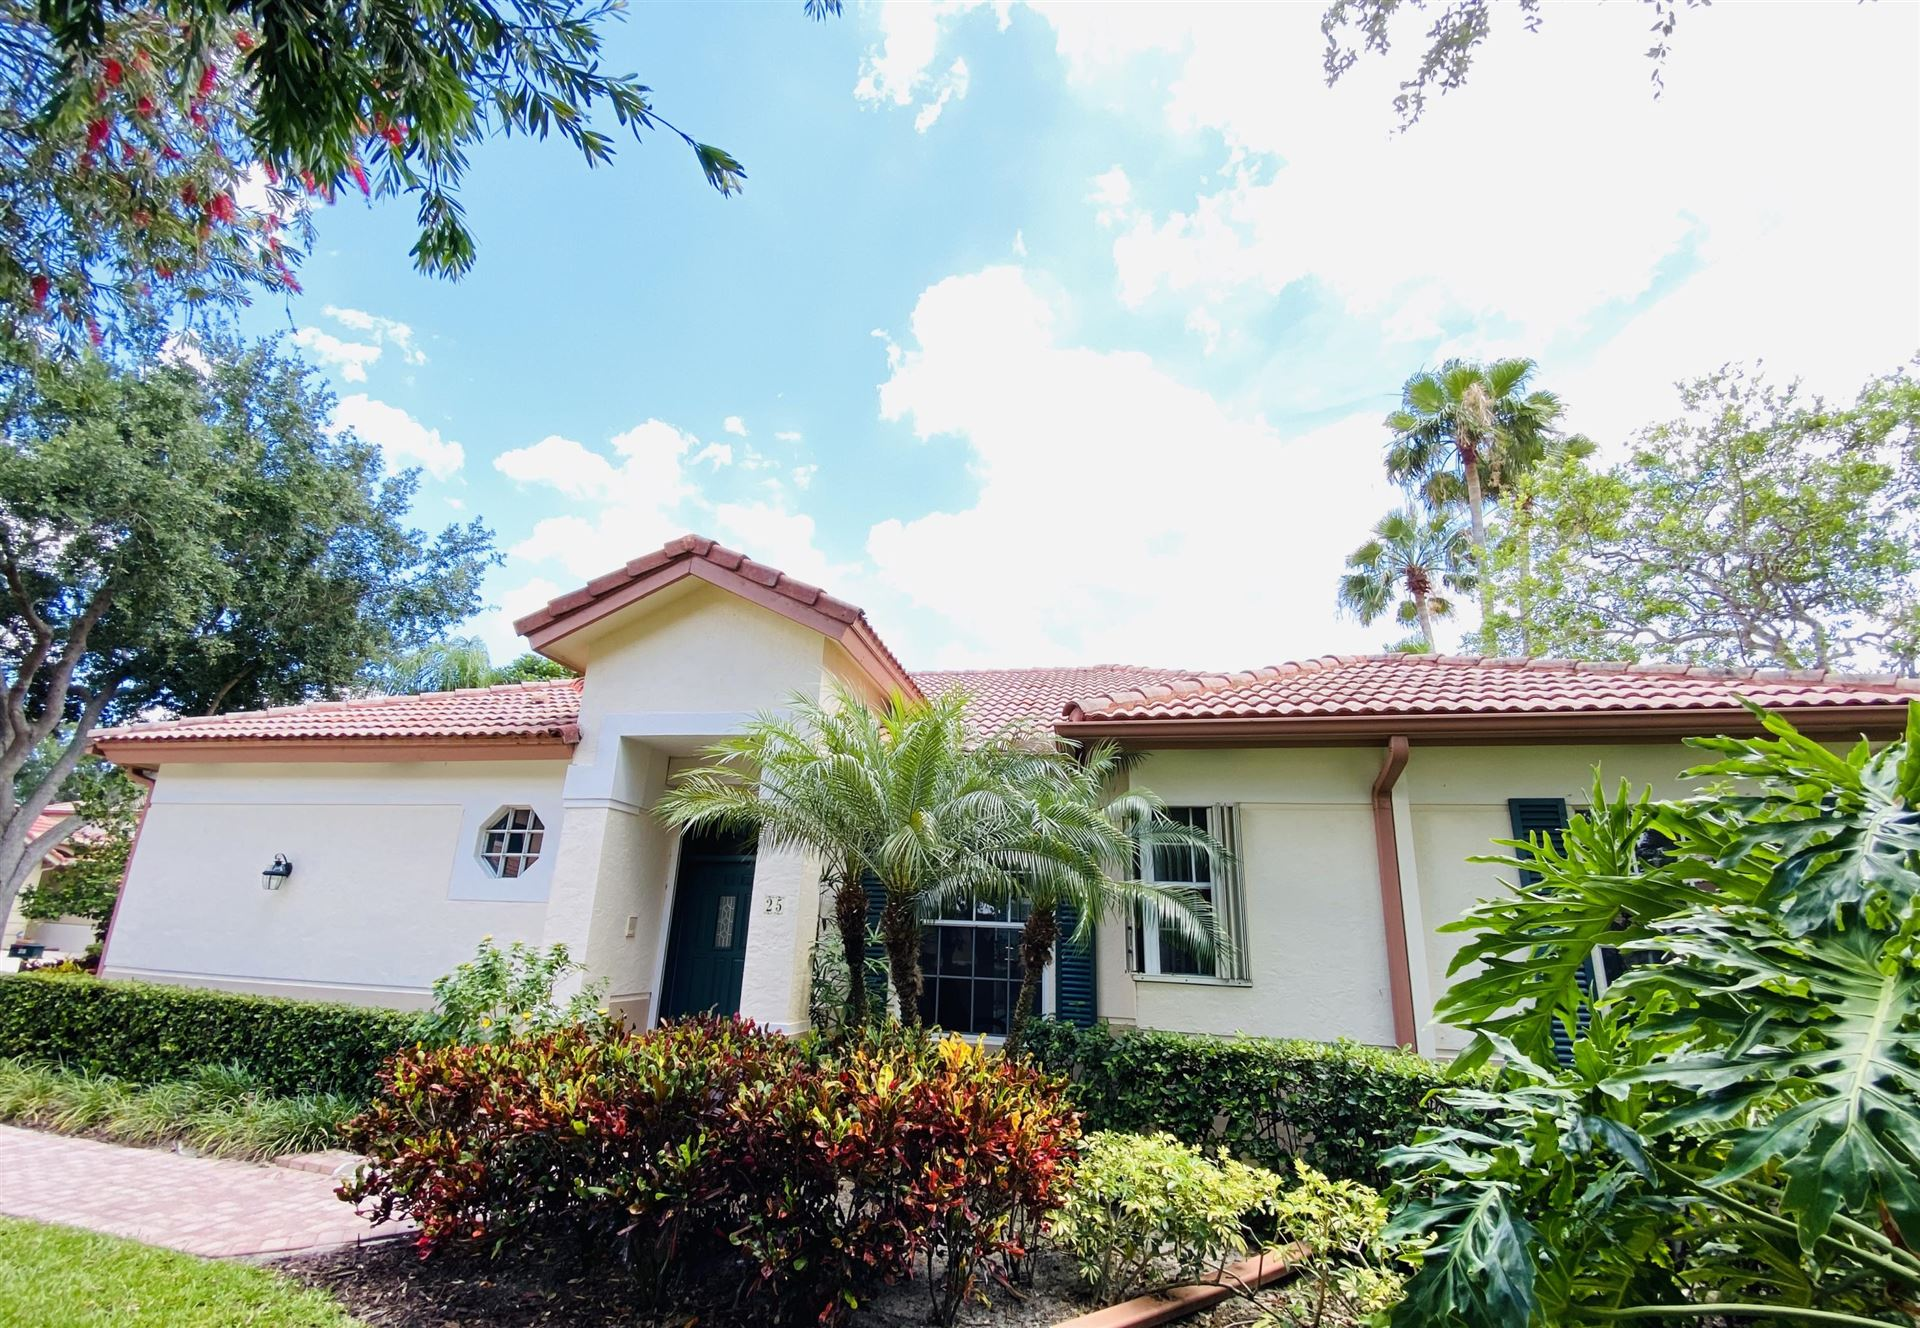 Photo of 25 Porta Vista Circle, Palm Beach Gardens, FL 33418 (MLS # RX-10619081)